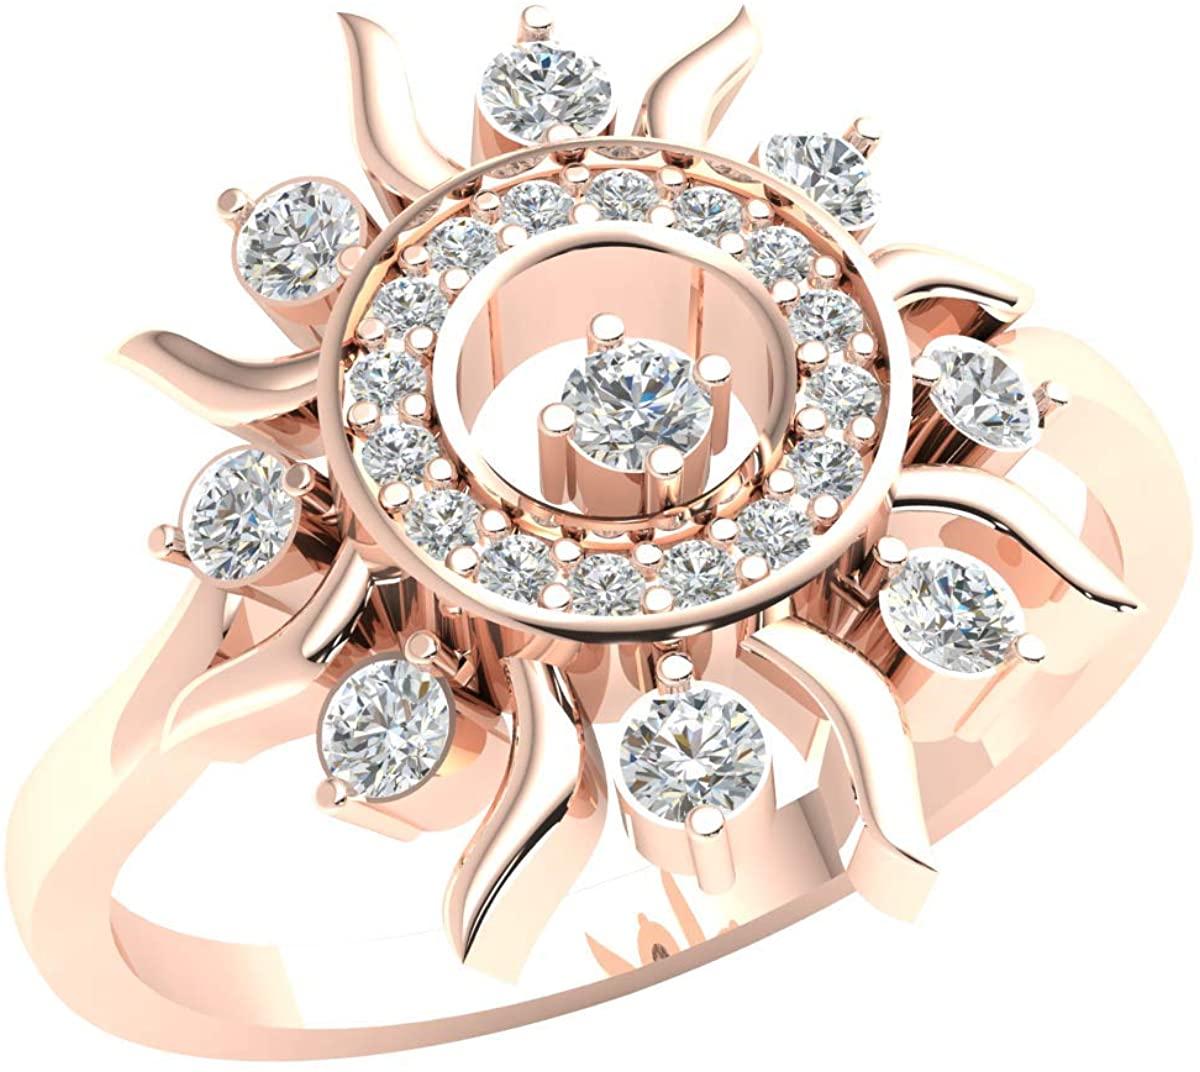 18k Gold Halo Engagement Ring For Women 0.33ctw Round Cut Diamond G VS2